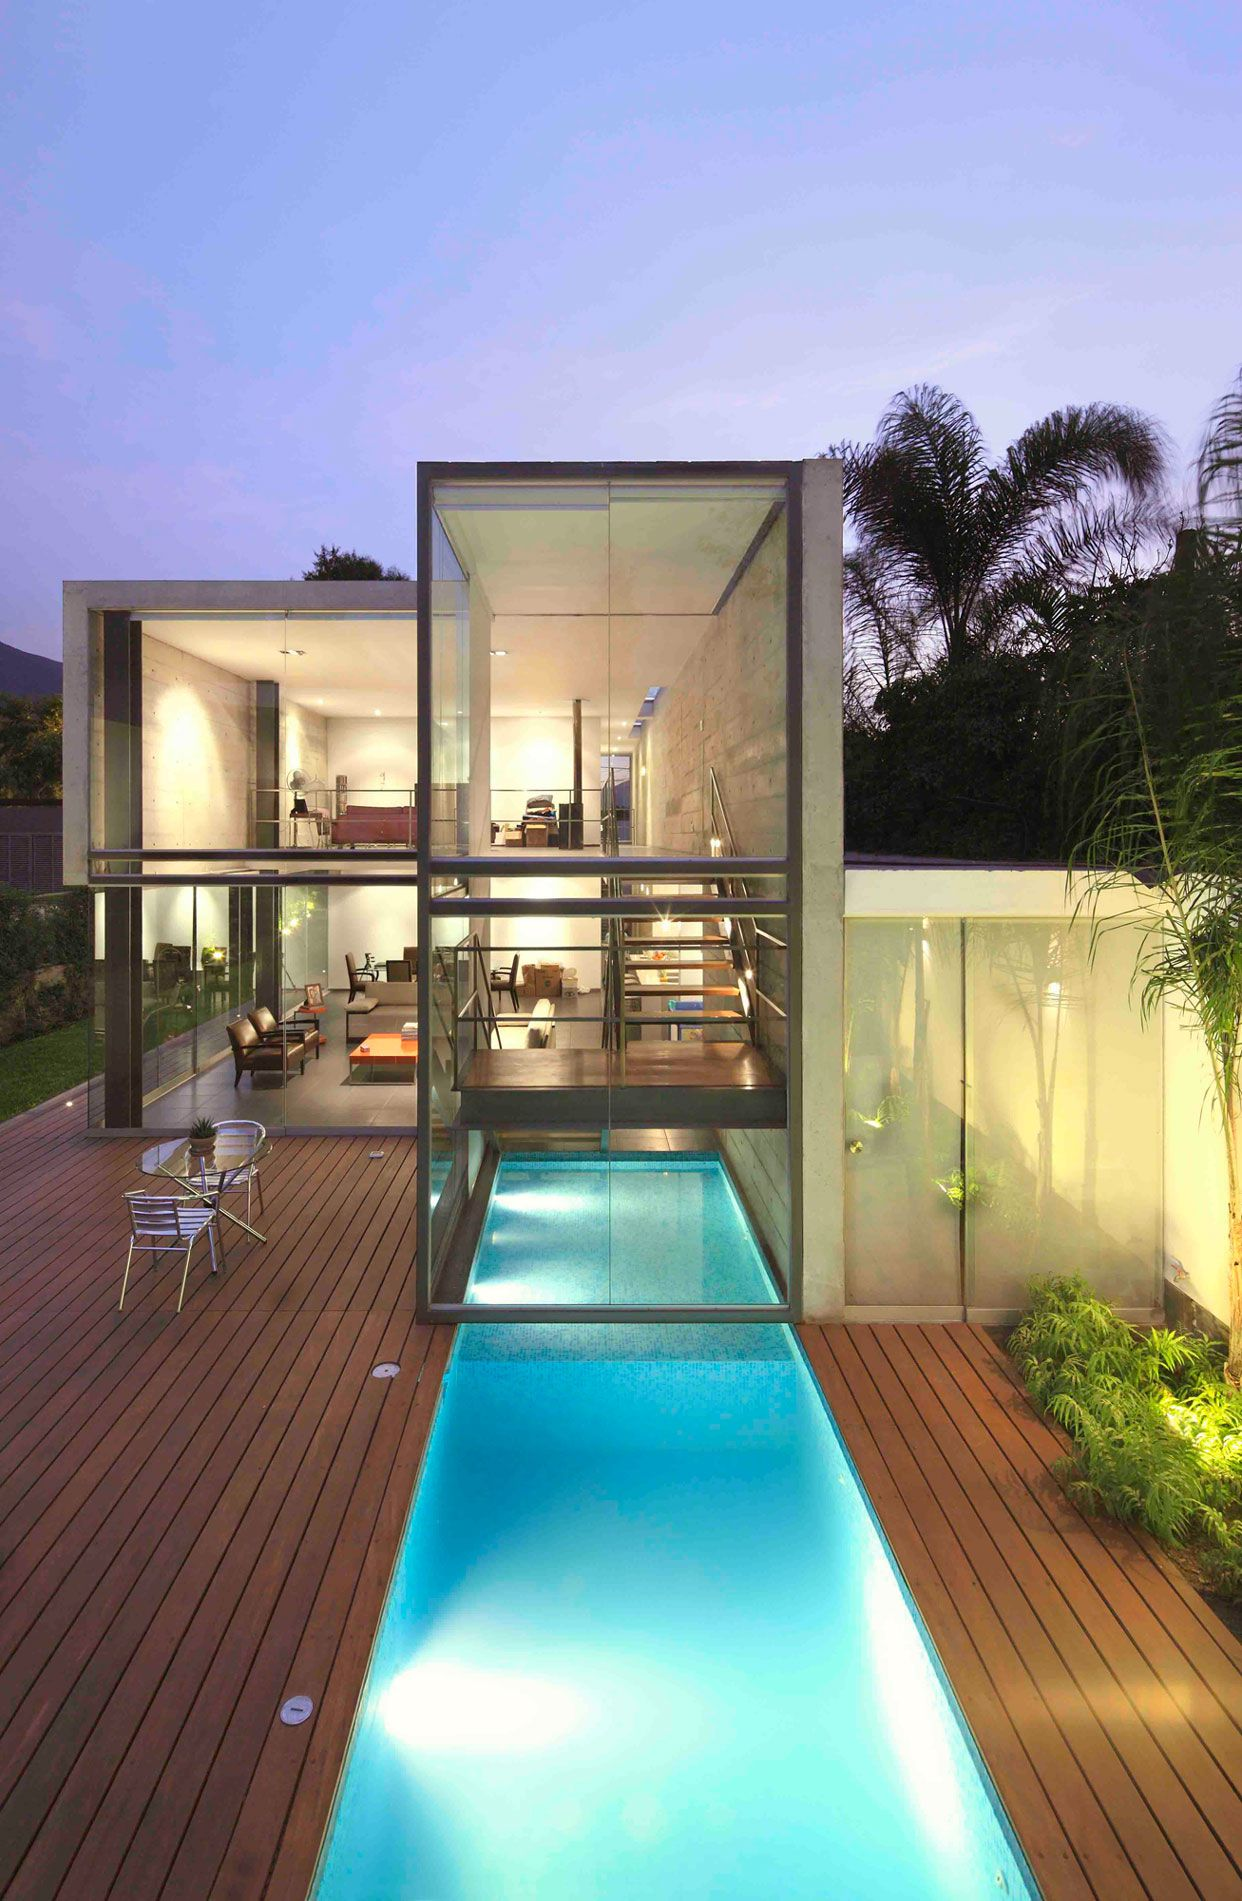 House-in-La-Planicie-05